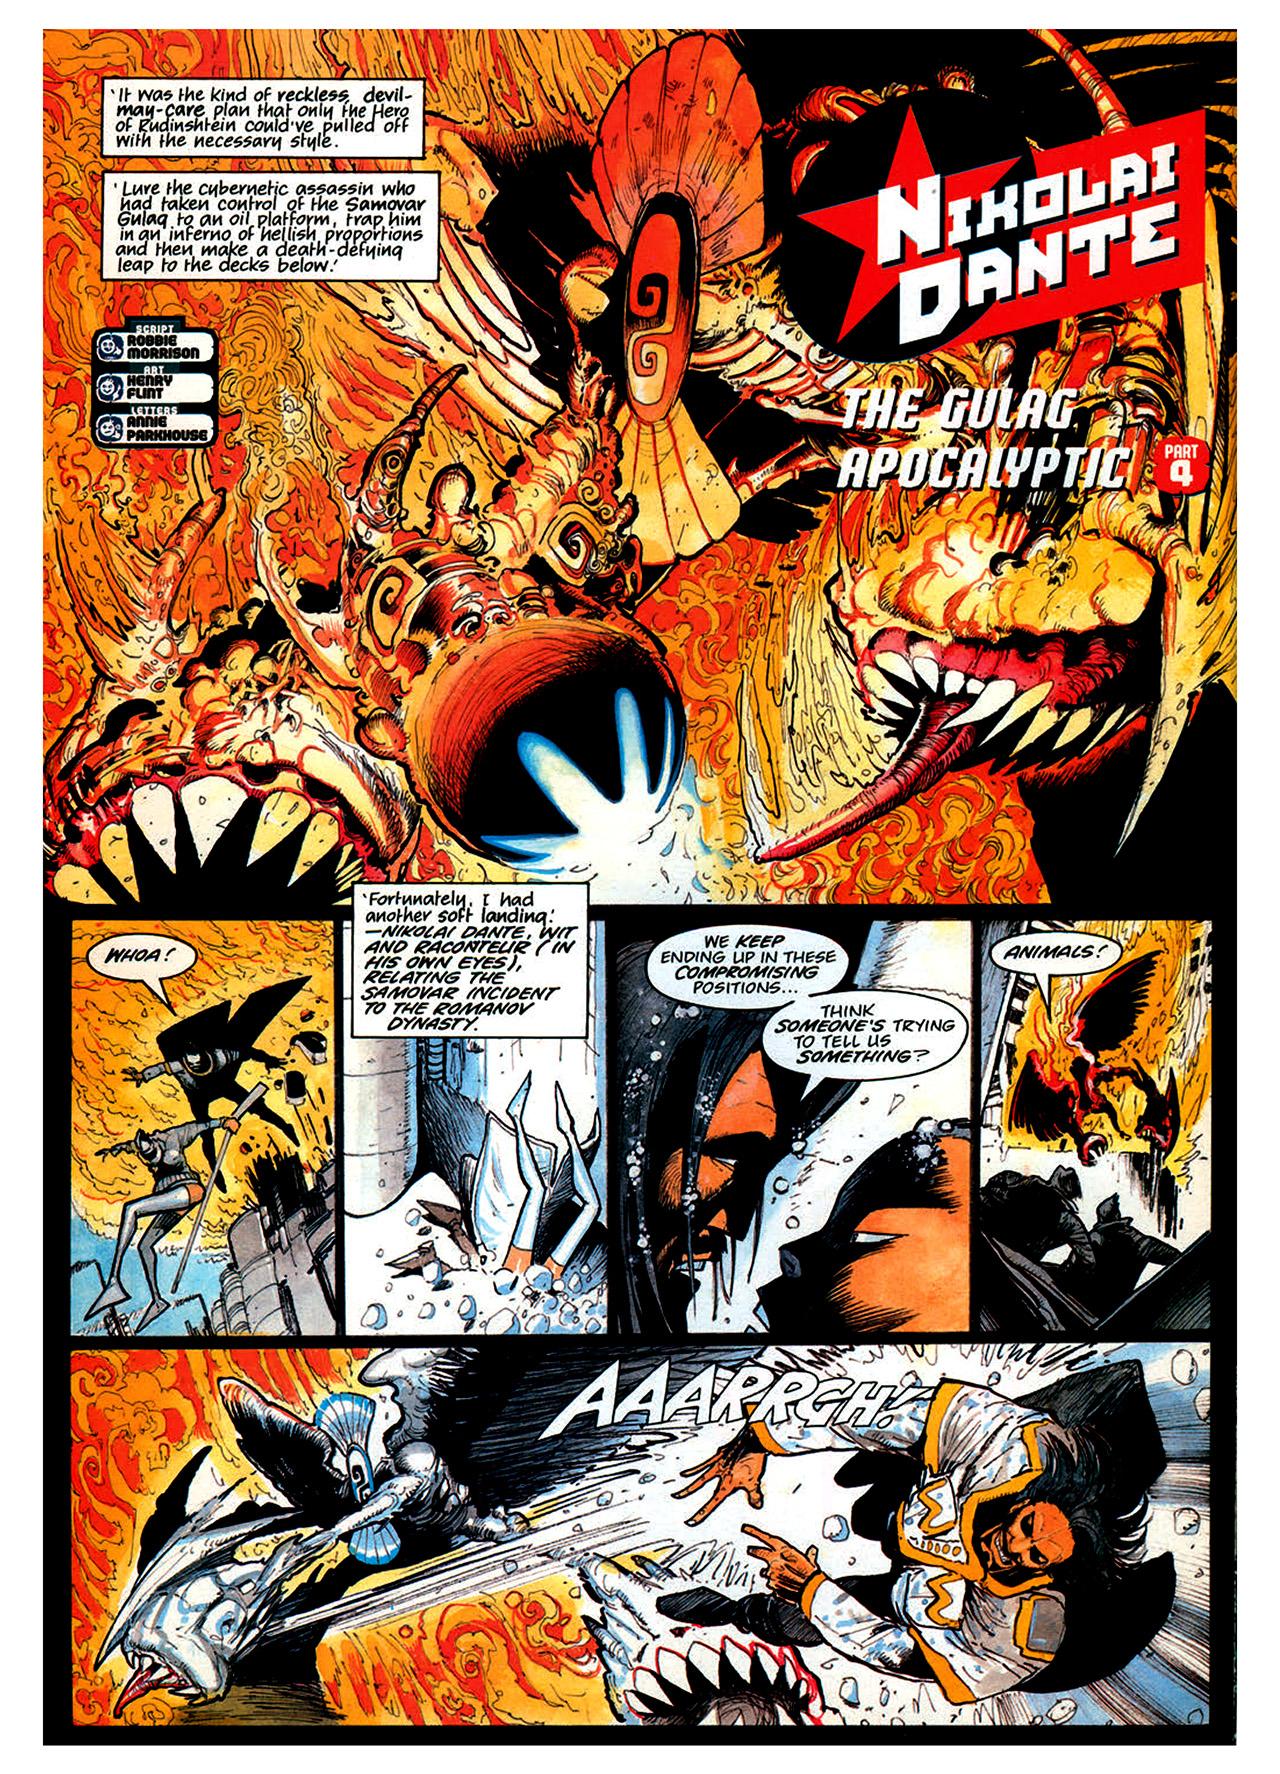 Read online Nikolai Dante comic -  Issue # TPB 1 - 172